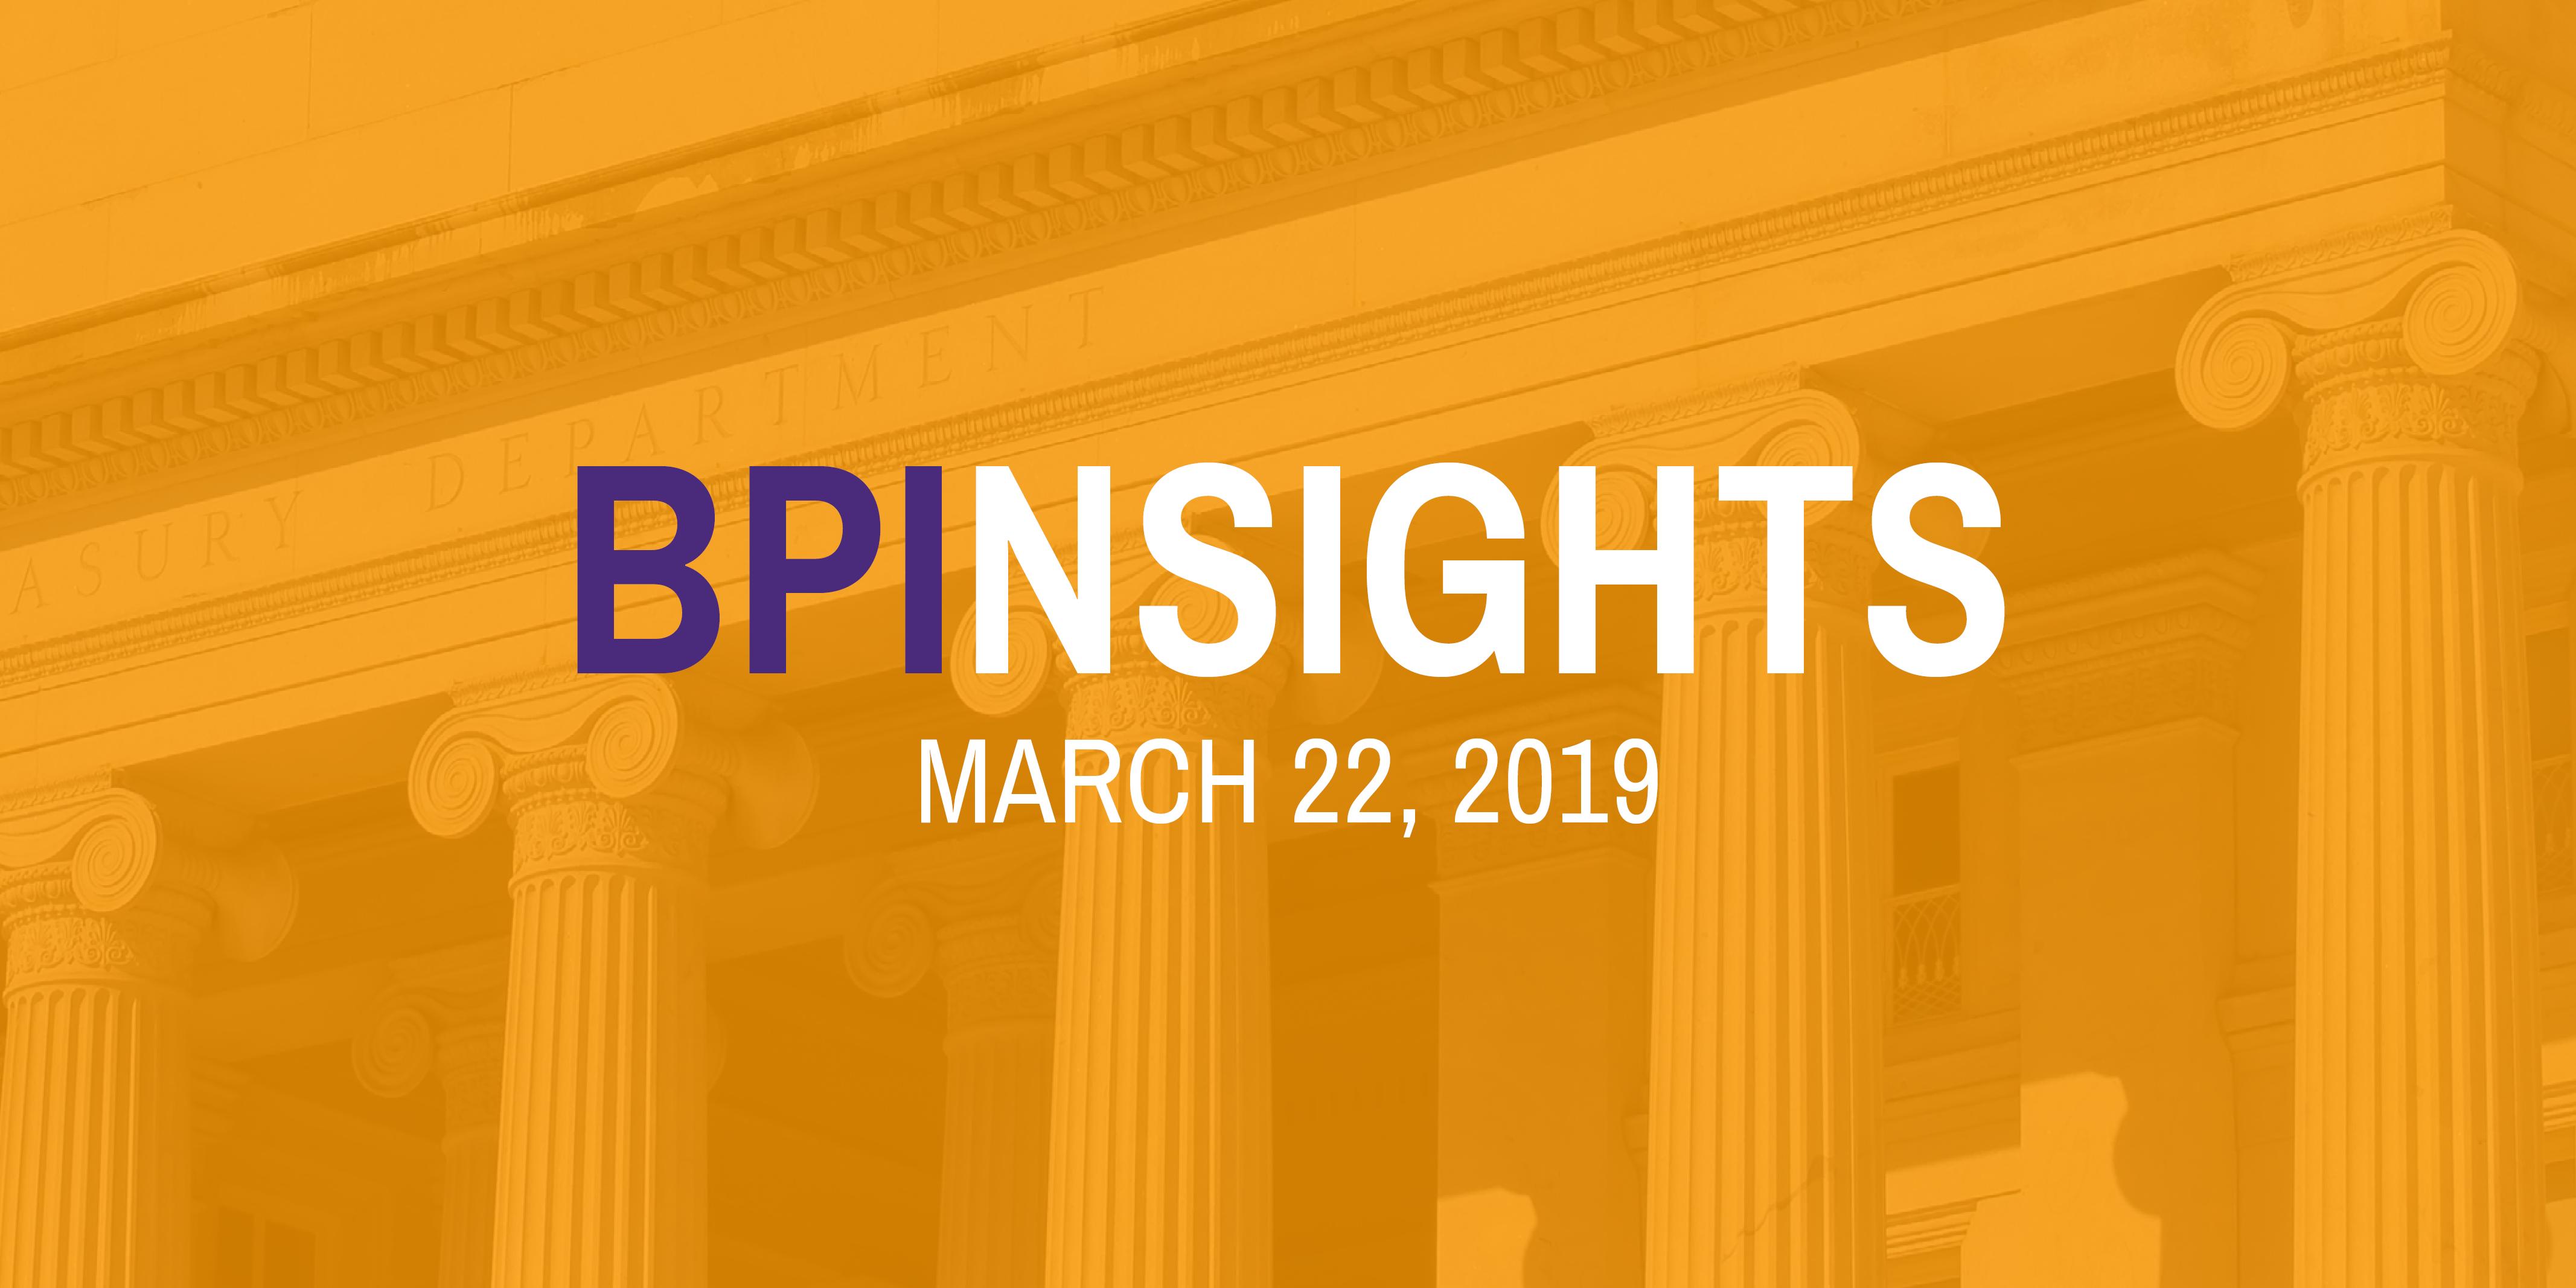 BPInsights: March 22, 2019